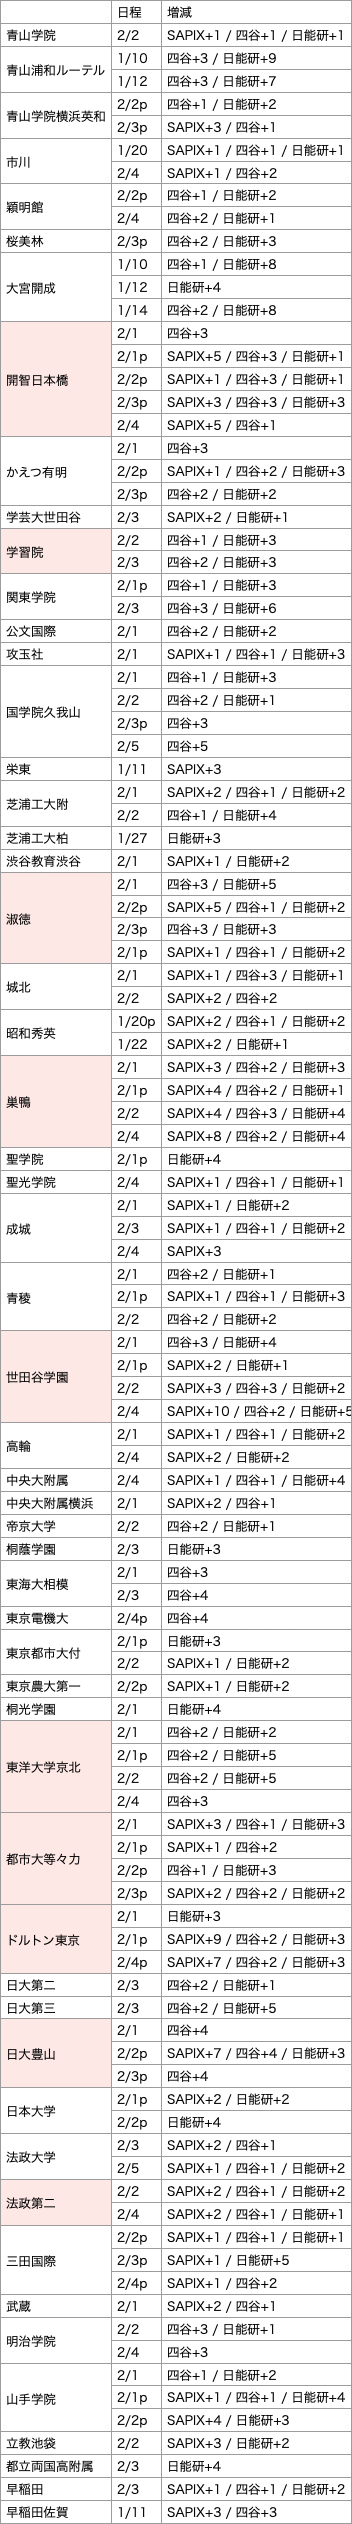 https://e-tutor.tokyo/data/20200821/05.png